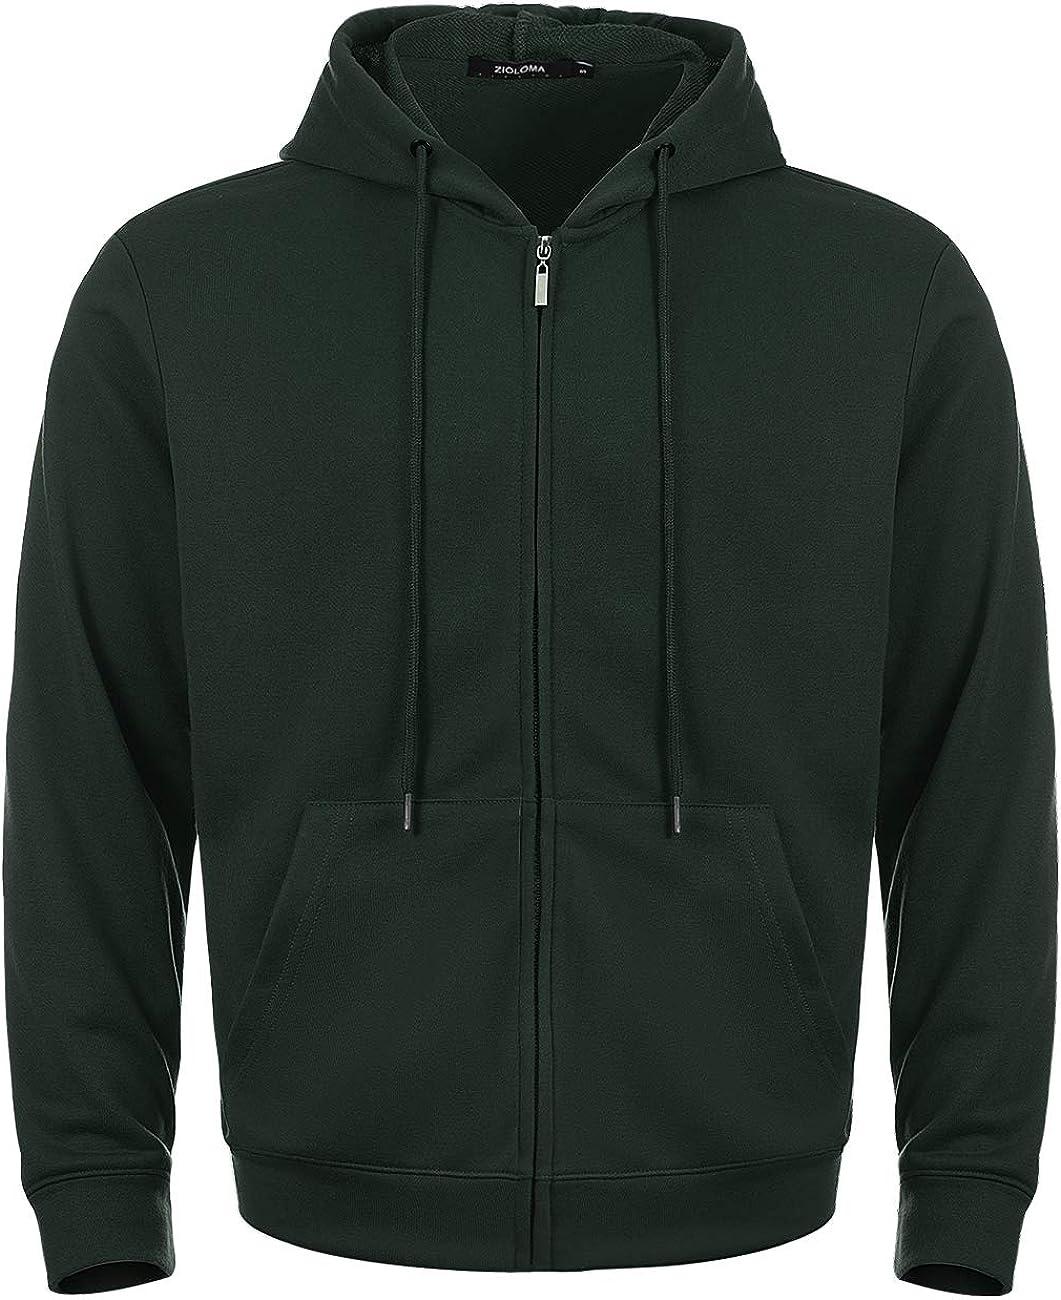 ZIOLOMA Mens Lightweight Full Zip Up Hoodie Hooded Active Sweatshirt: Clothing